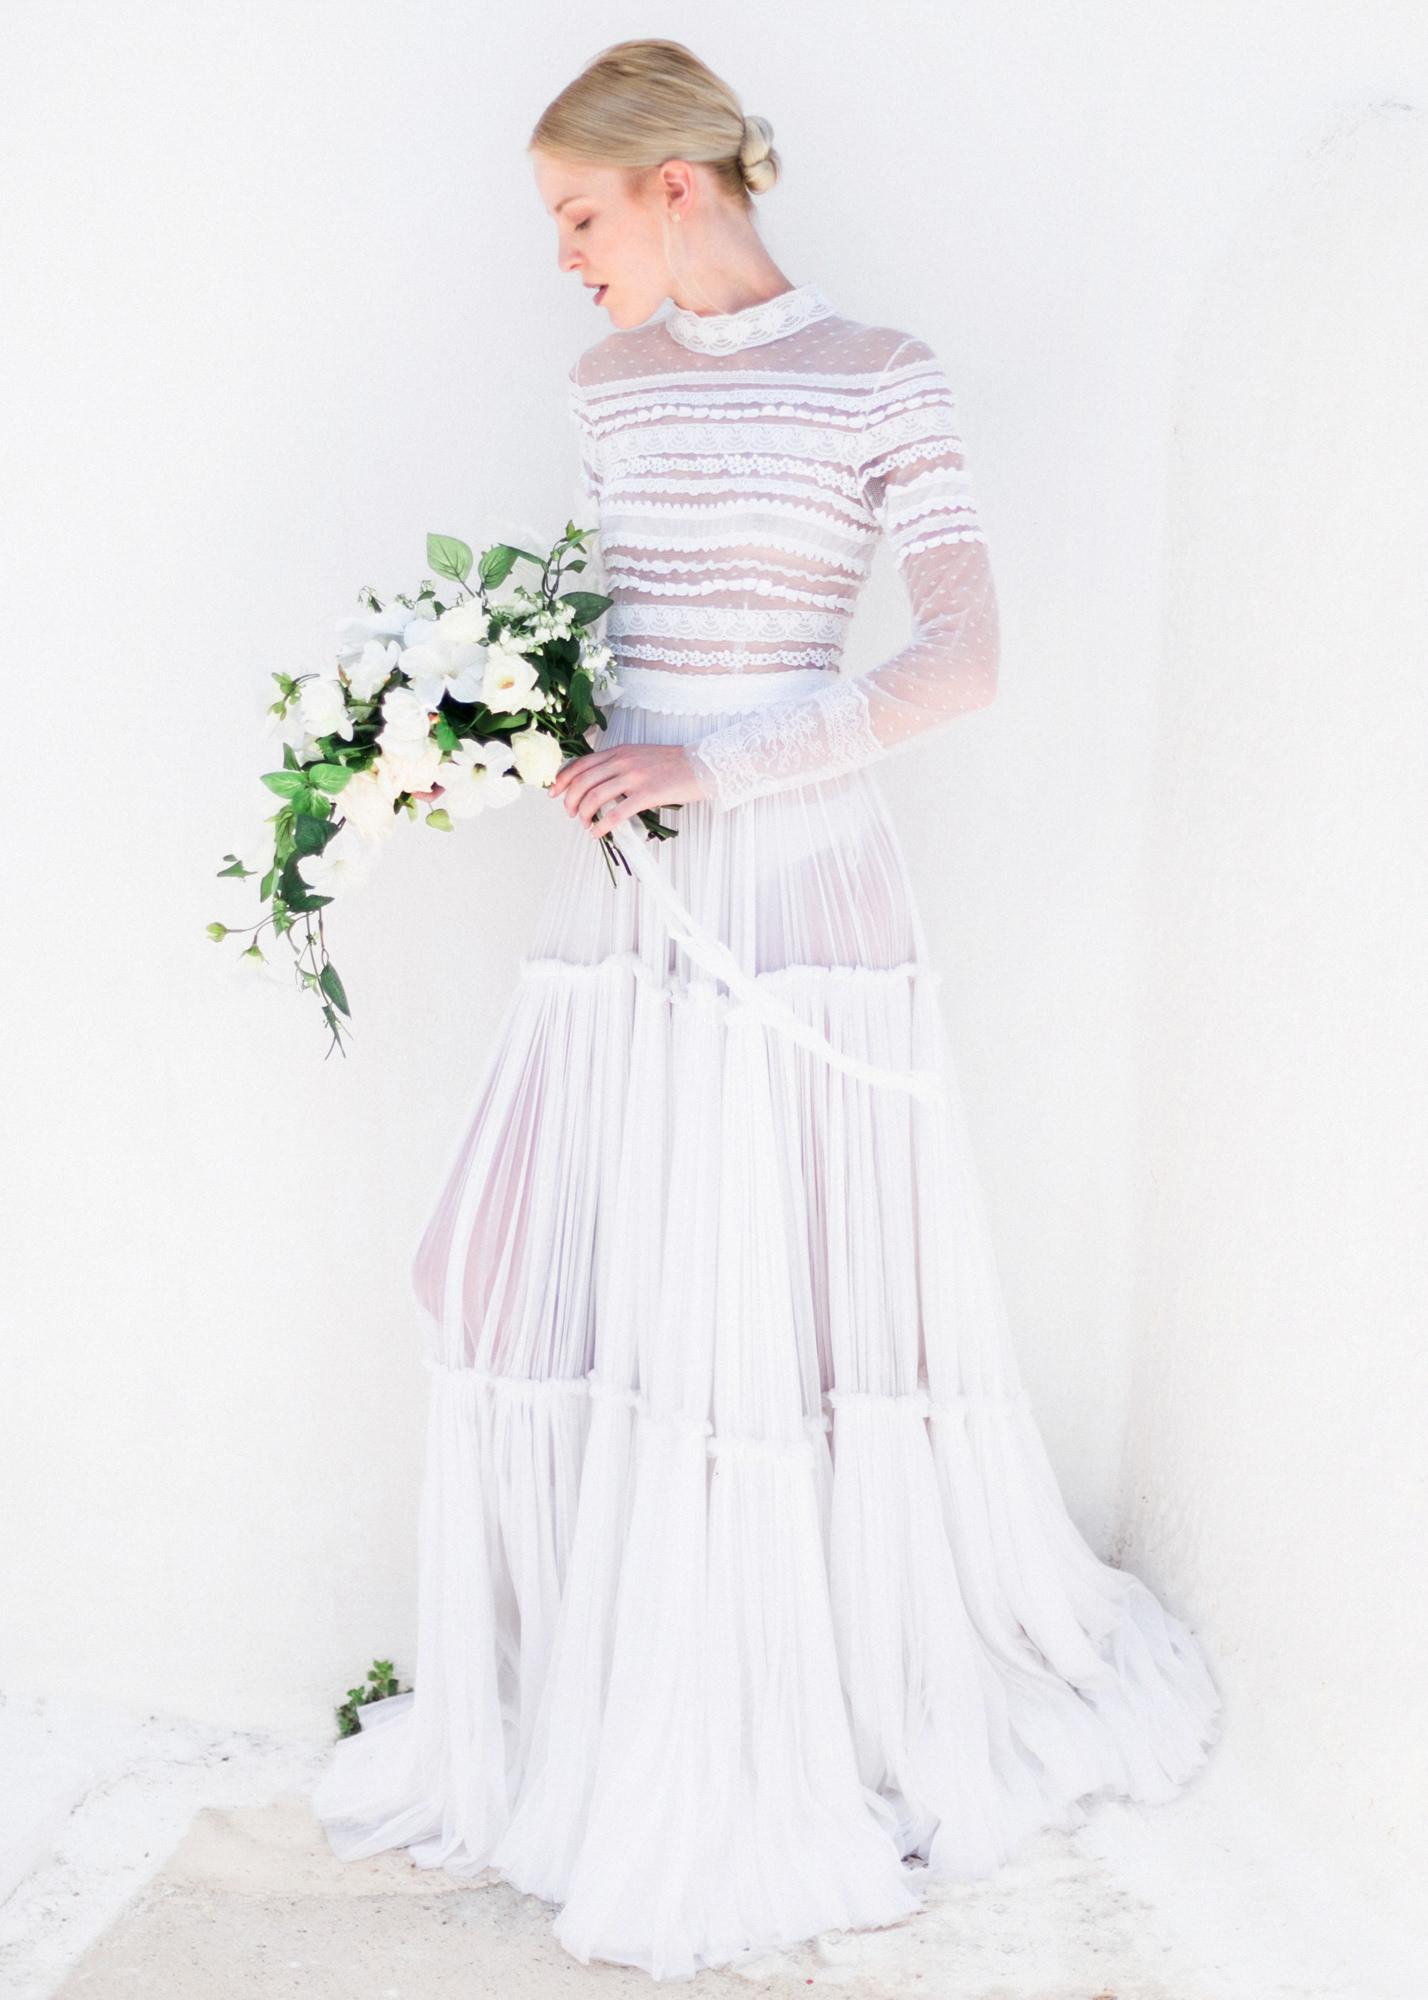 18-portrait-santorini-wedding-photographer-greece-b-v